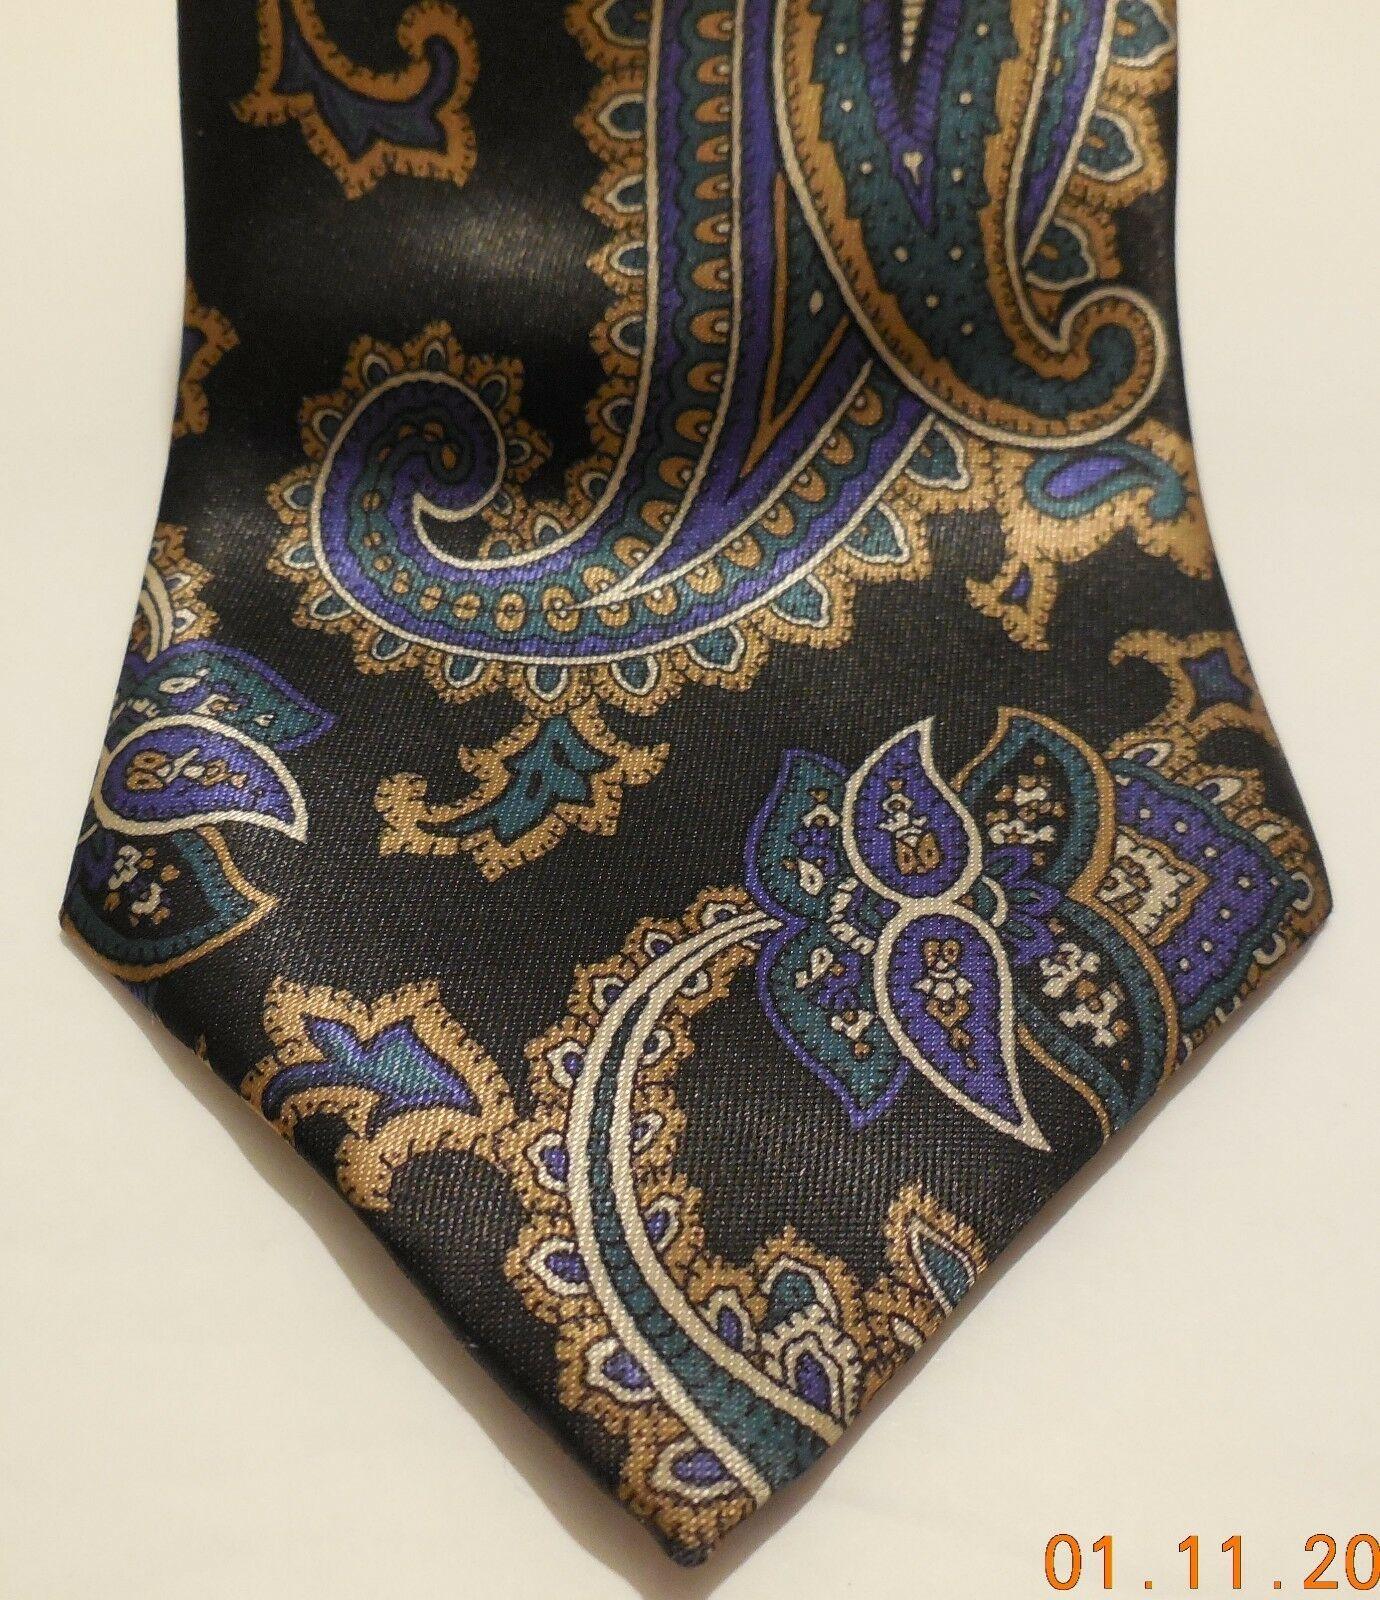 "Mens Geoffery Beene Polyester and silk Neck Tie 58"" long 3 1/2"" wide #3 Necktie image 3"